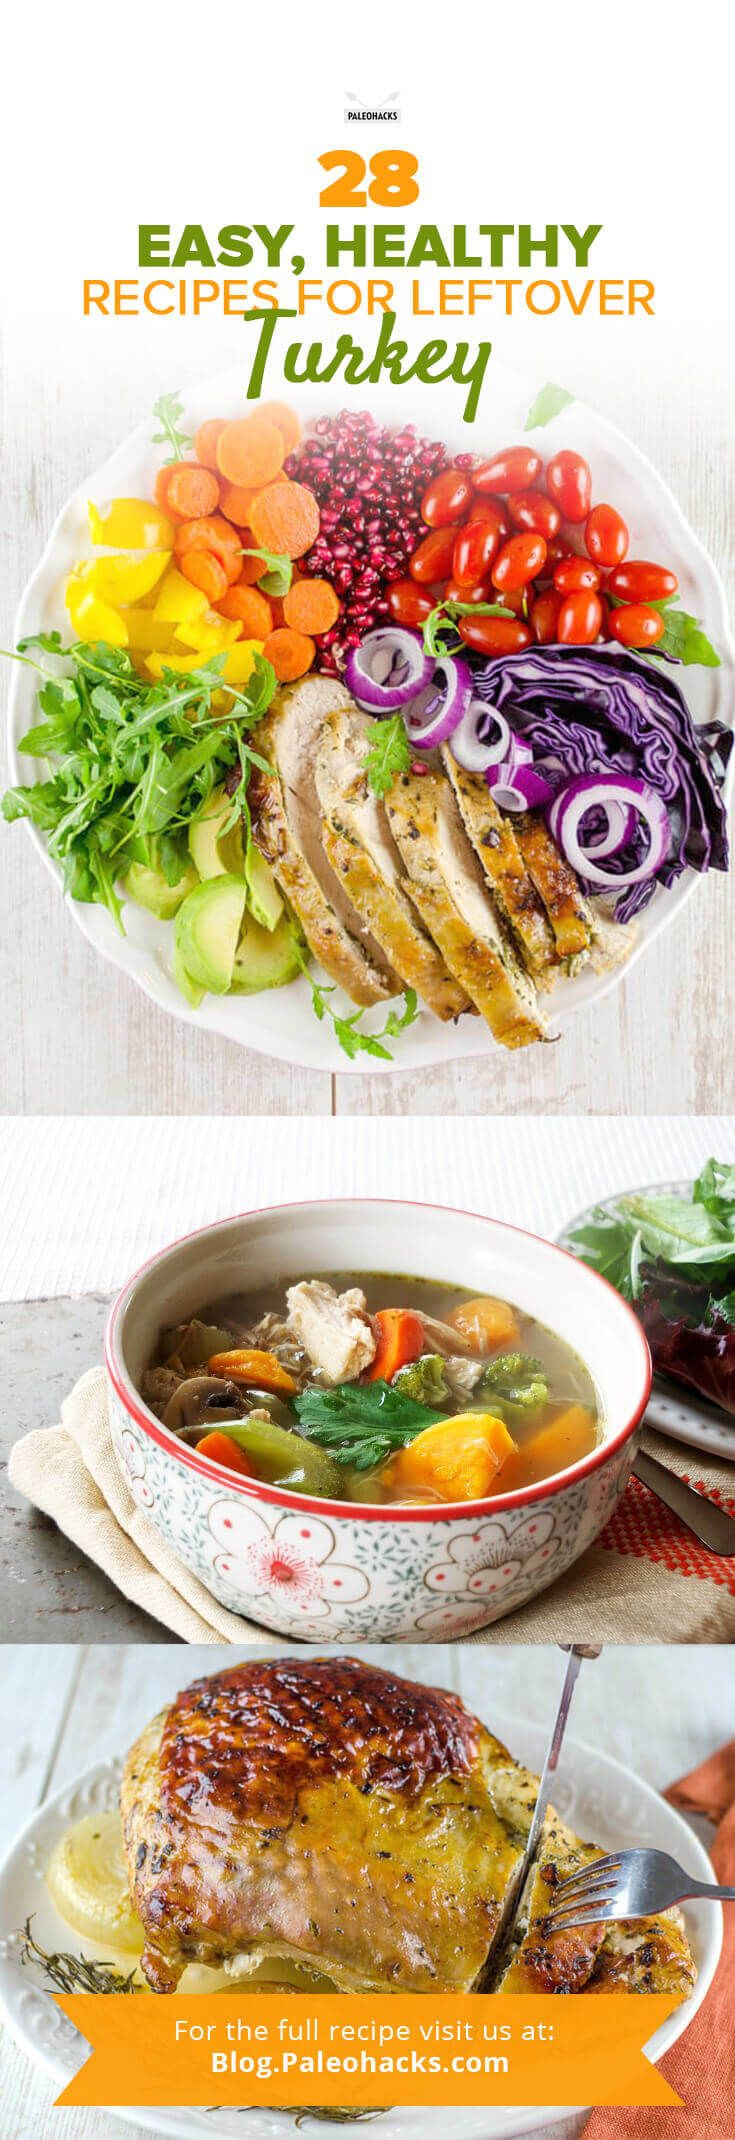 Easy Healthy Thanksgiving Recipes  Healthy leftover turkey recipes easy Food easy recipes